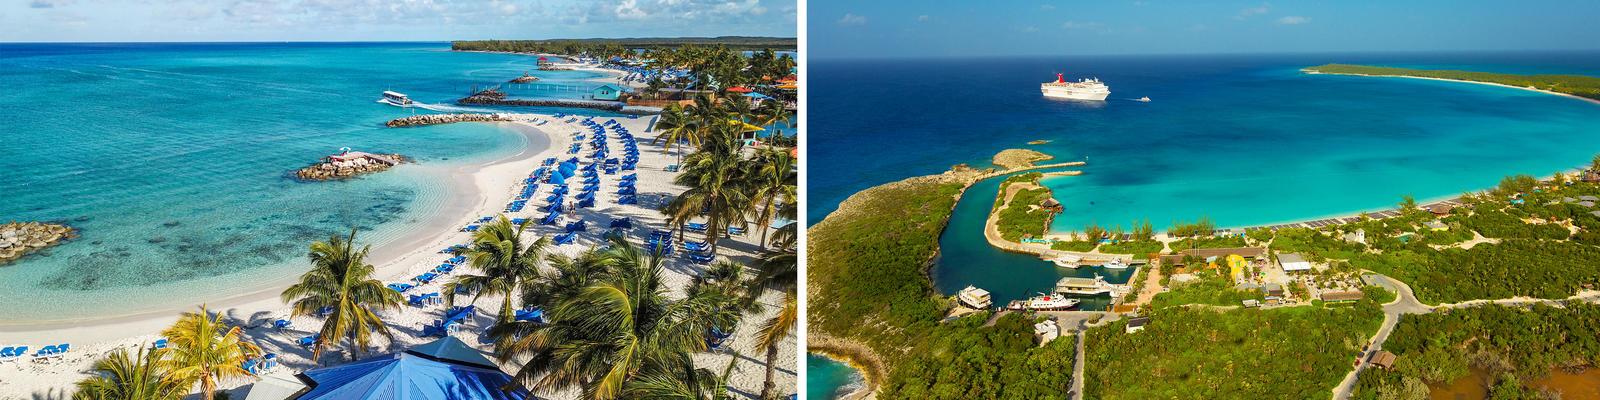 Princess Cays vs. Half Moon Cay (Photo: GGAM/Shutterstock/Carnival Cruise Line)